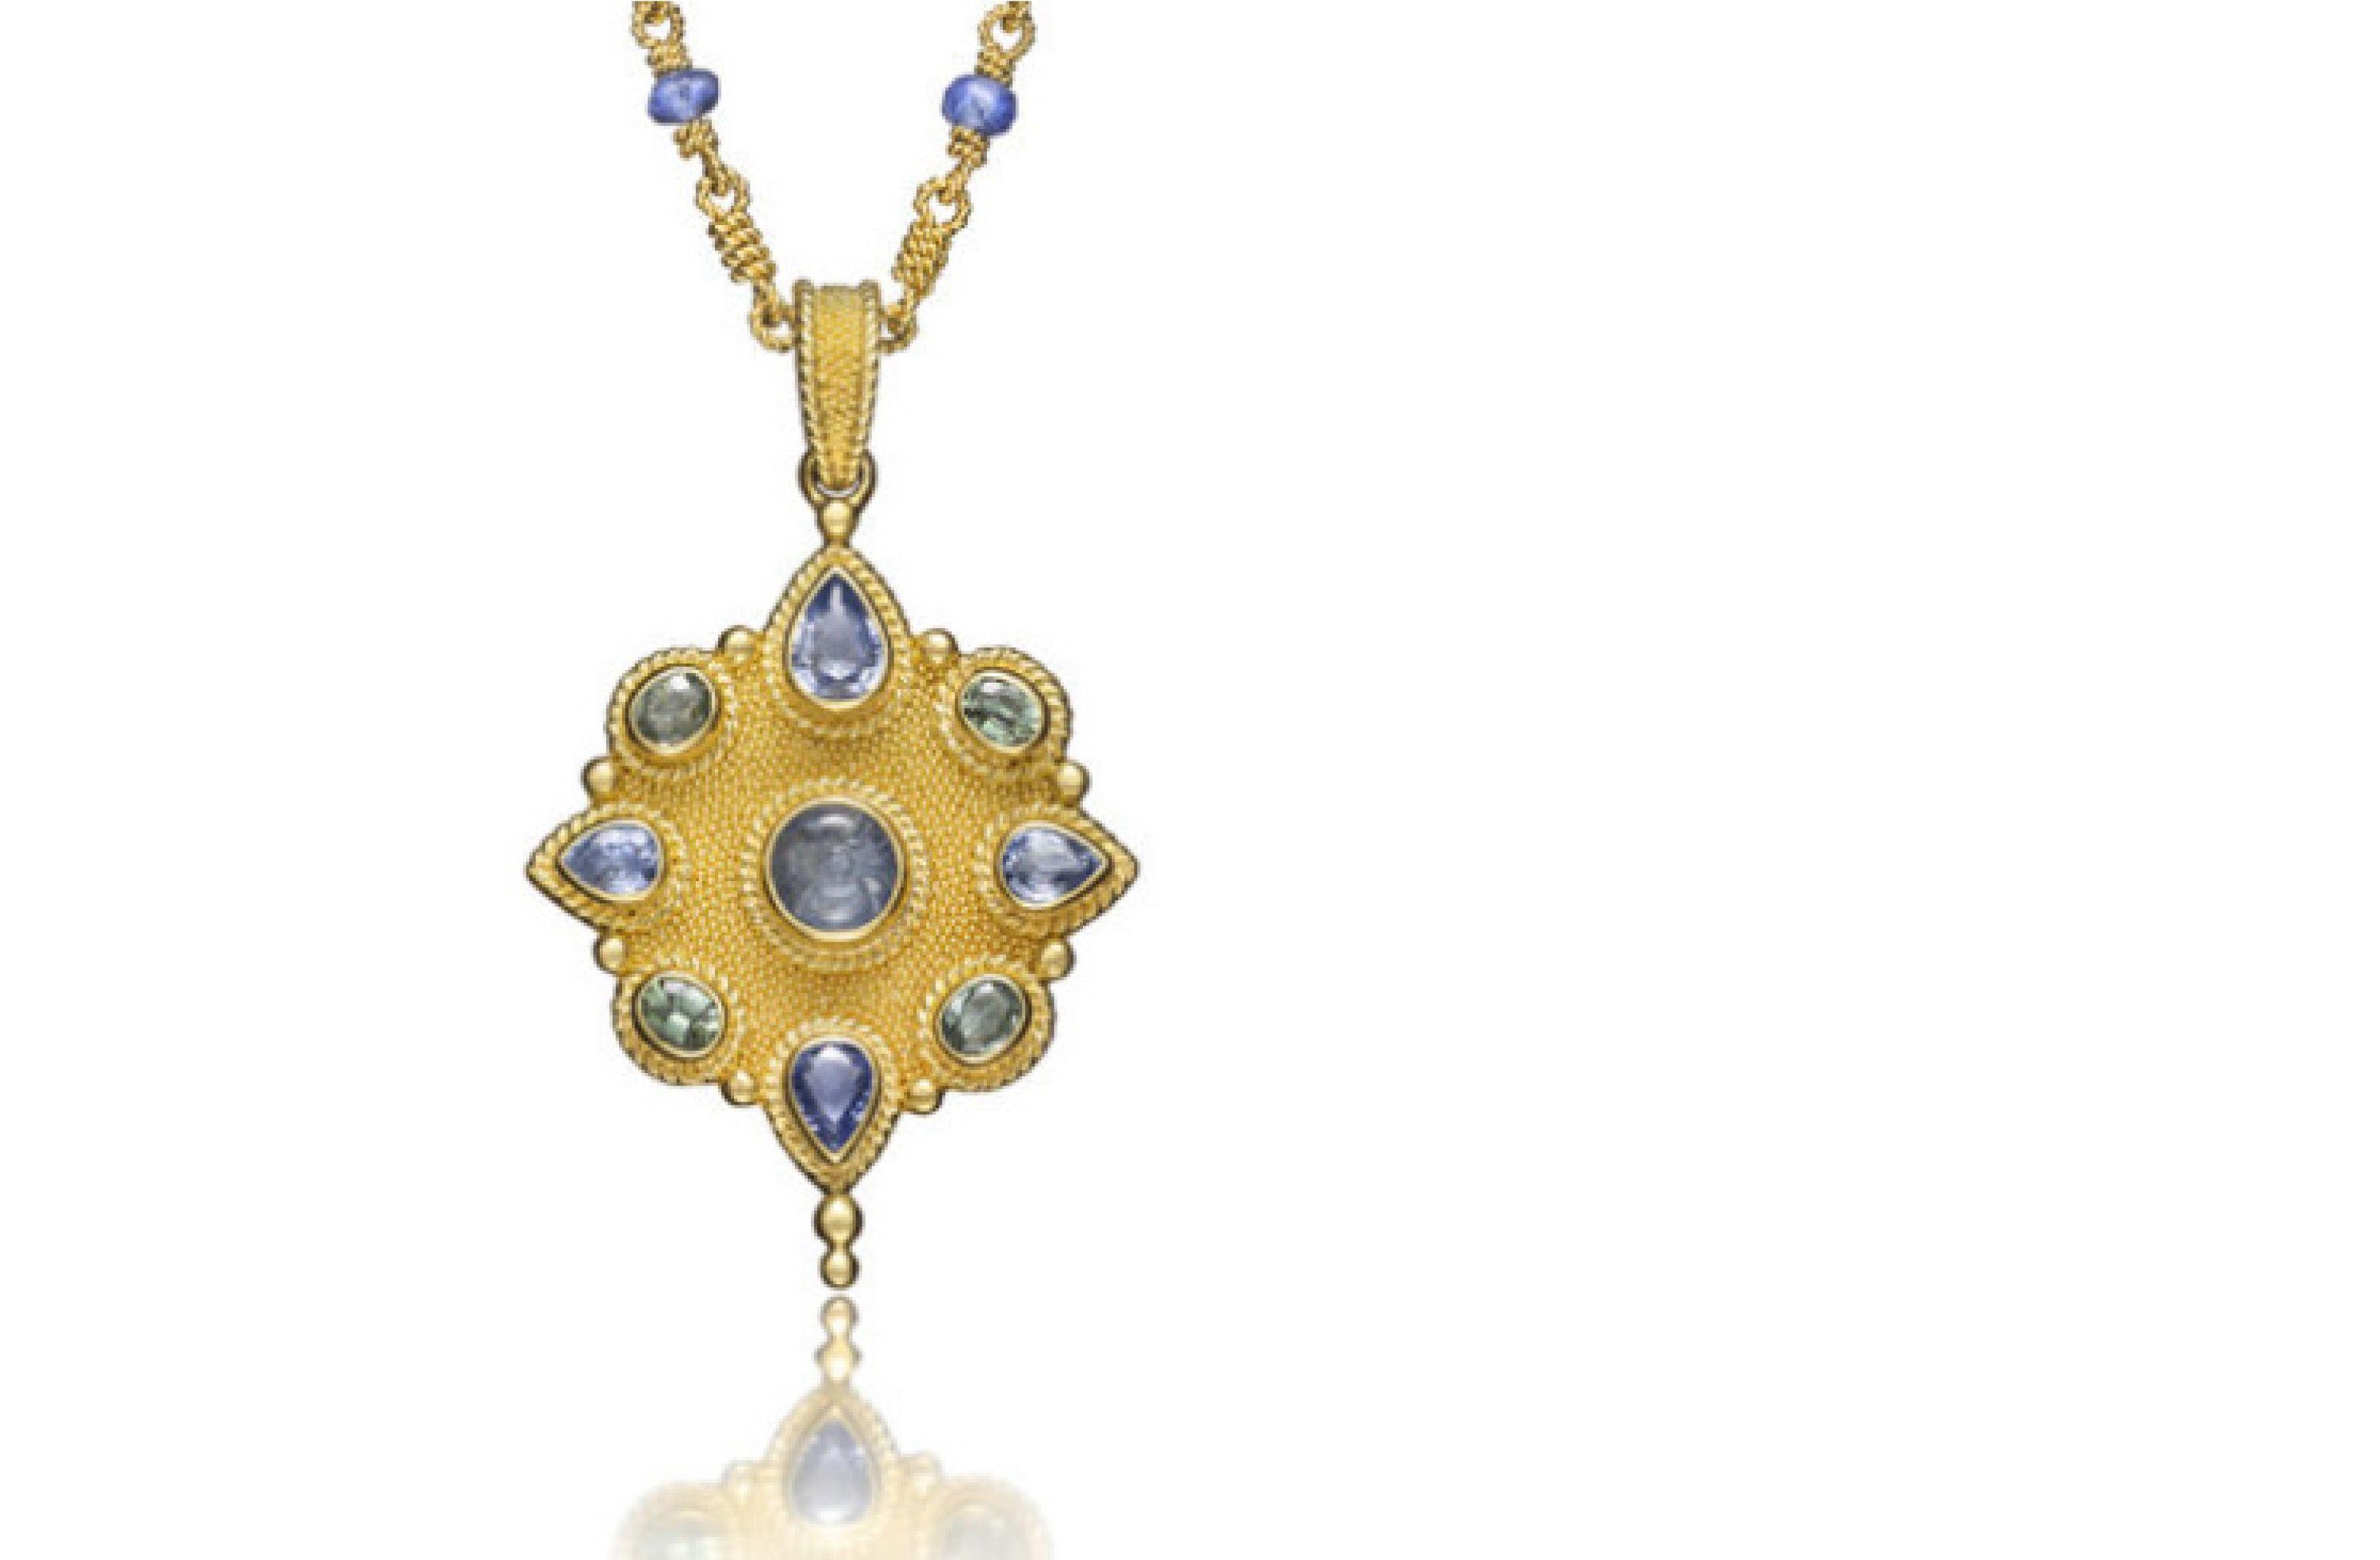 JewelryWhite_30.jpg